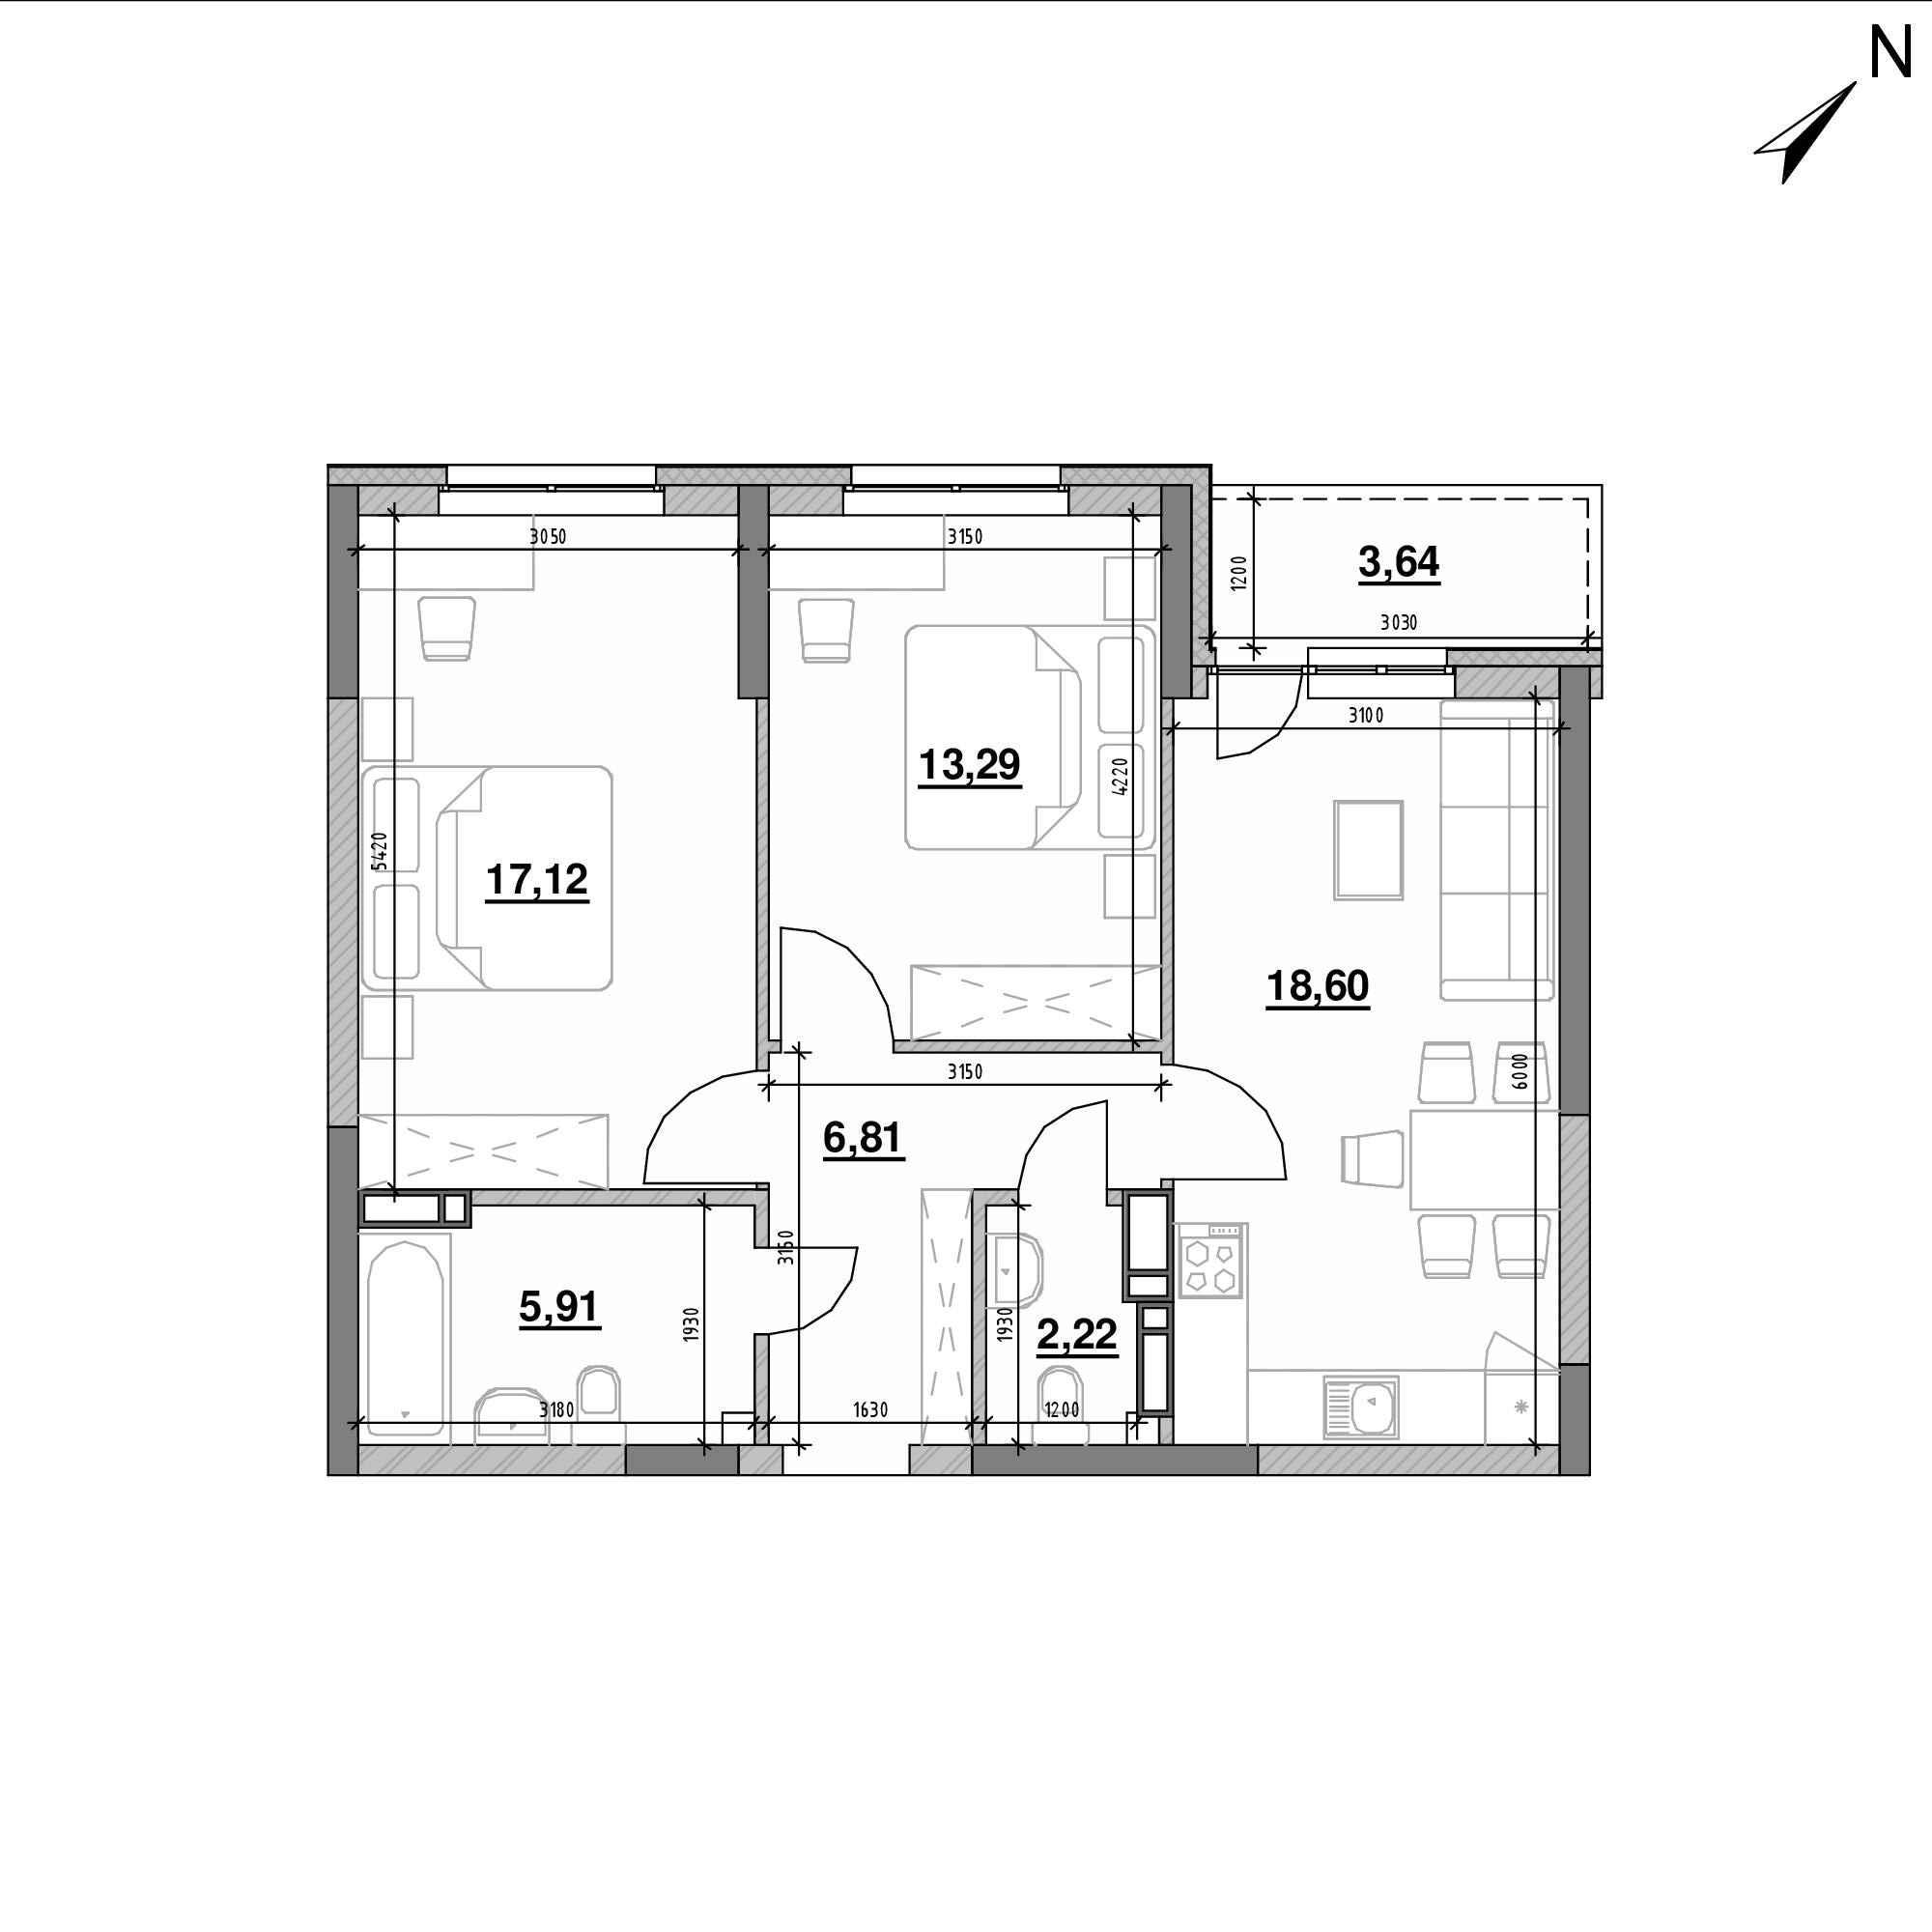 ЖК Оk'Land: планування 2-кімнатної квартири, №348, 67.59 м<sup>2</sup>